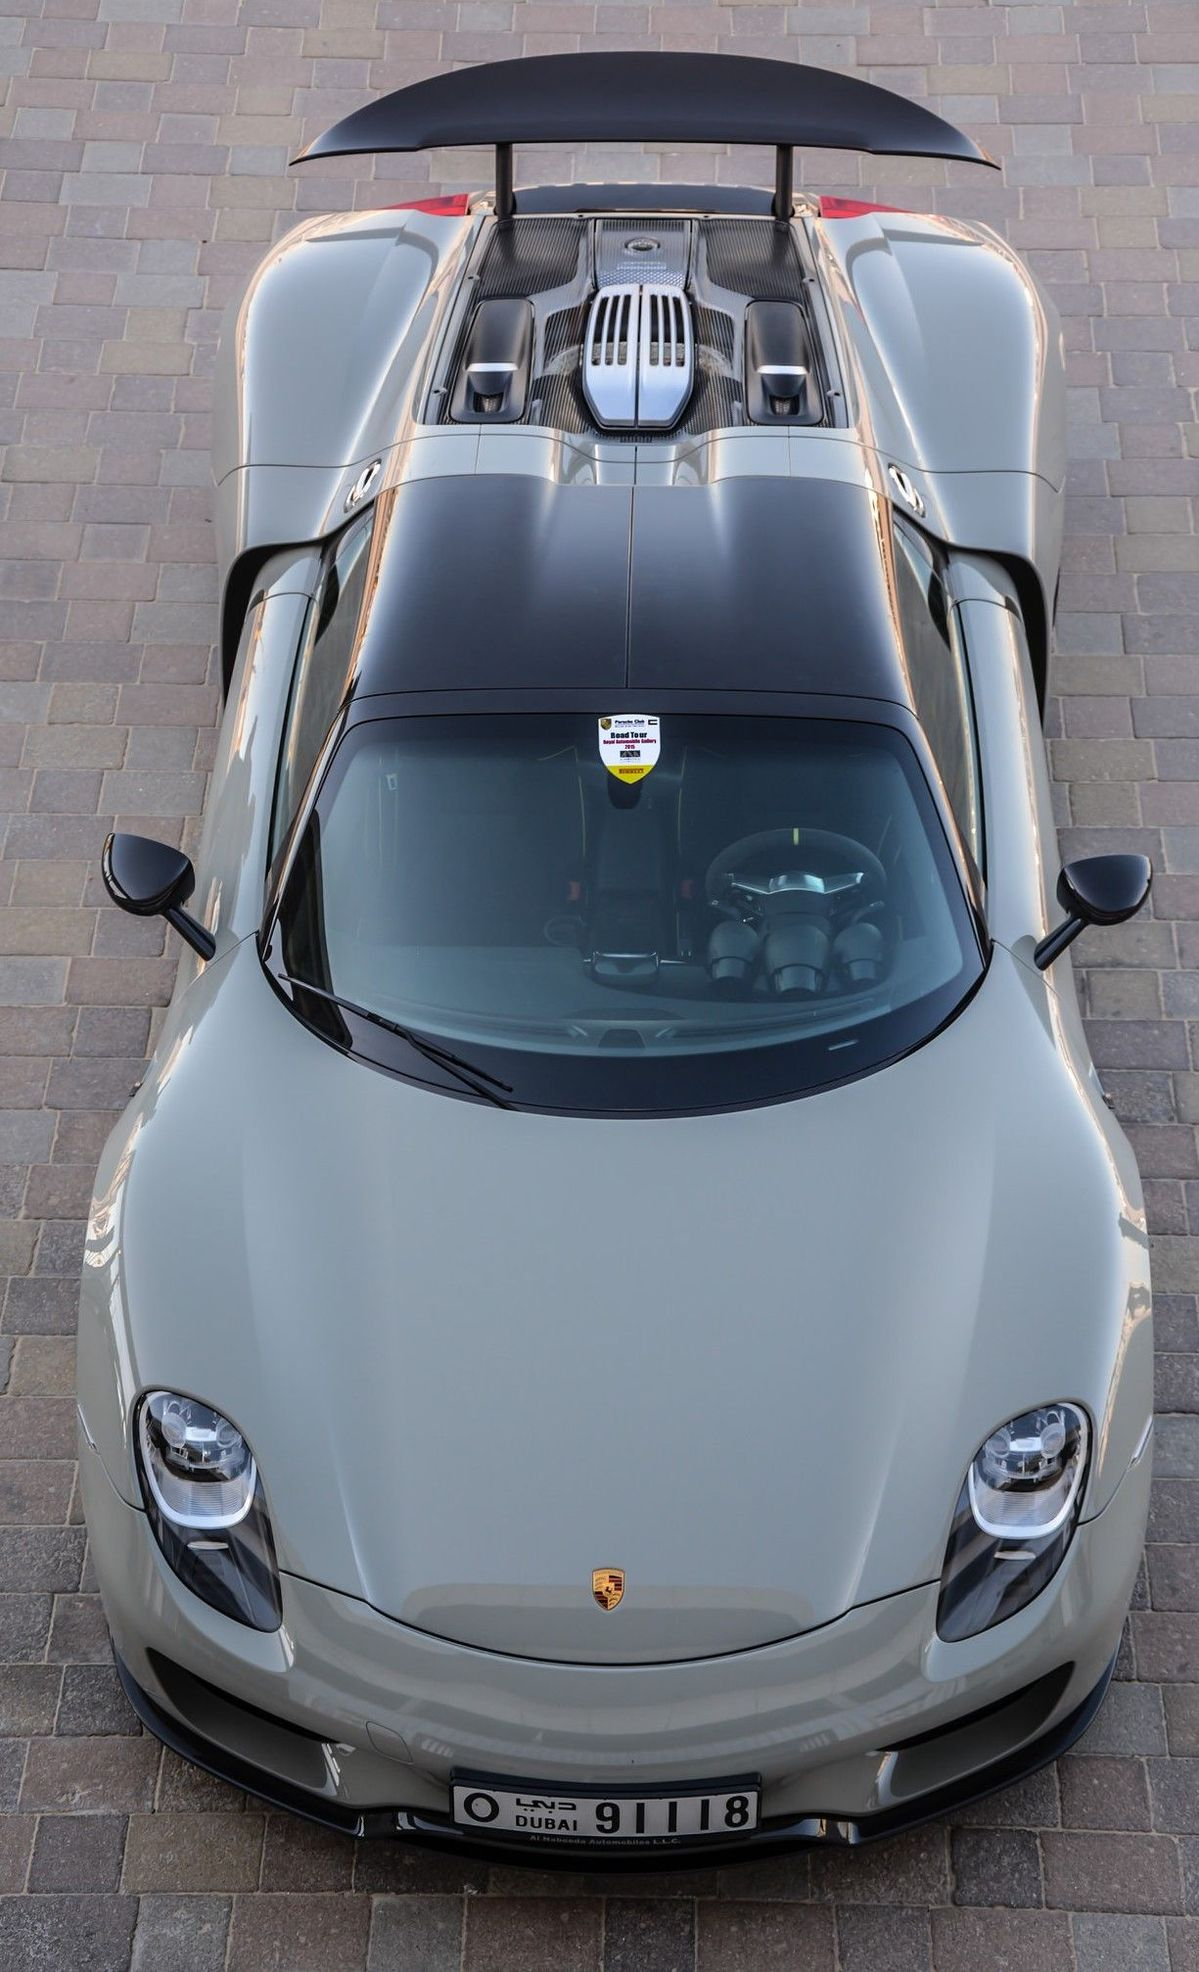 The $900k plus Porsche 918 Spyder, hybrid with amazing performance and a range of 12 miles in electric only mode… …repinned für Gewinner! – jetzt gratis Erfolgsratgeber sichern www.ratsucher.de (the substitute)